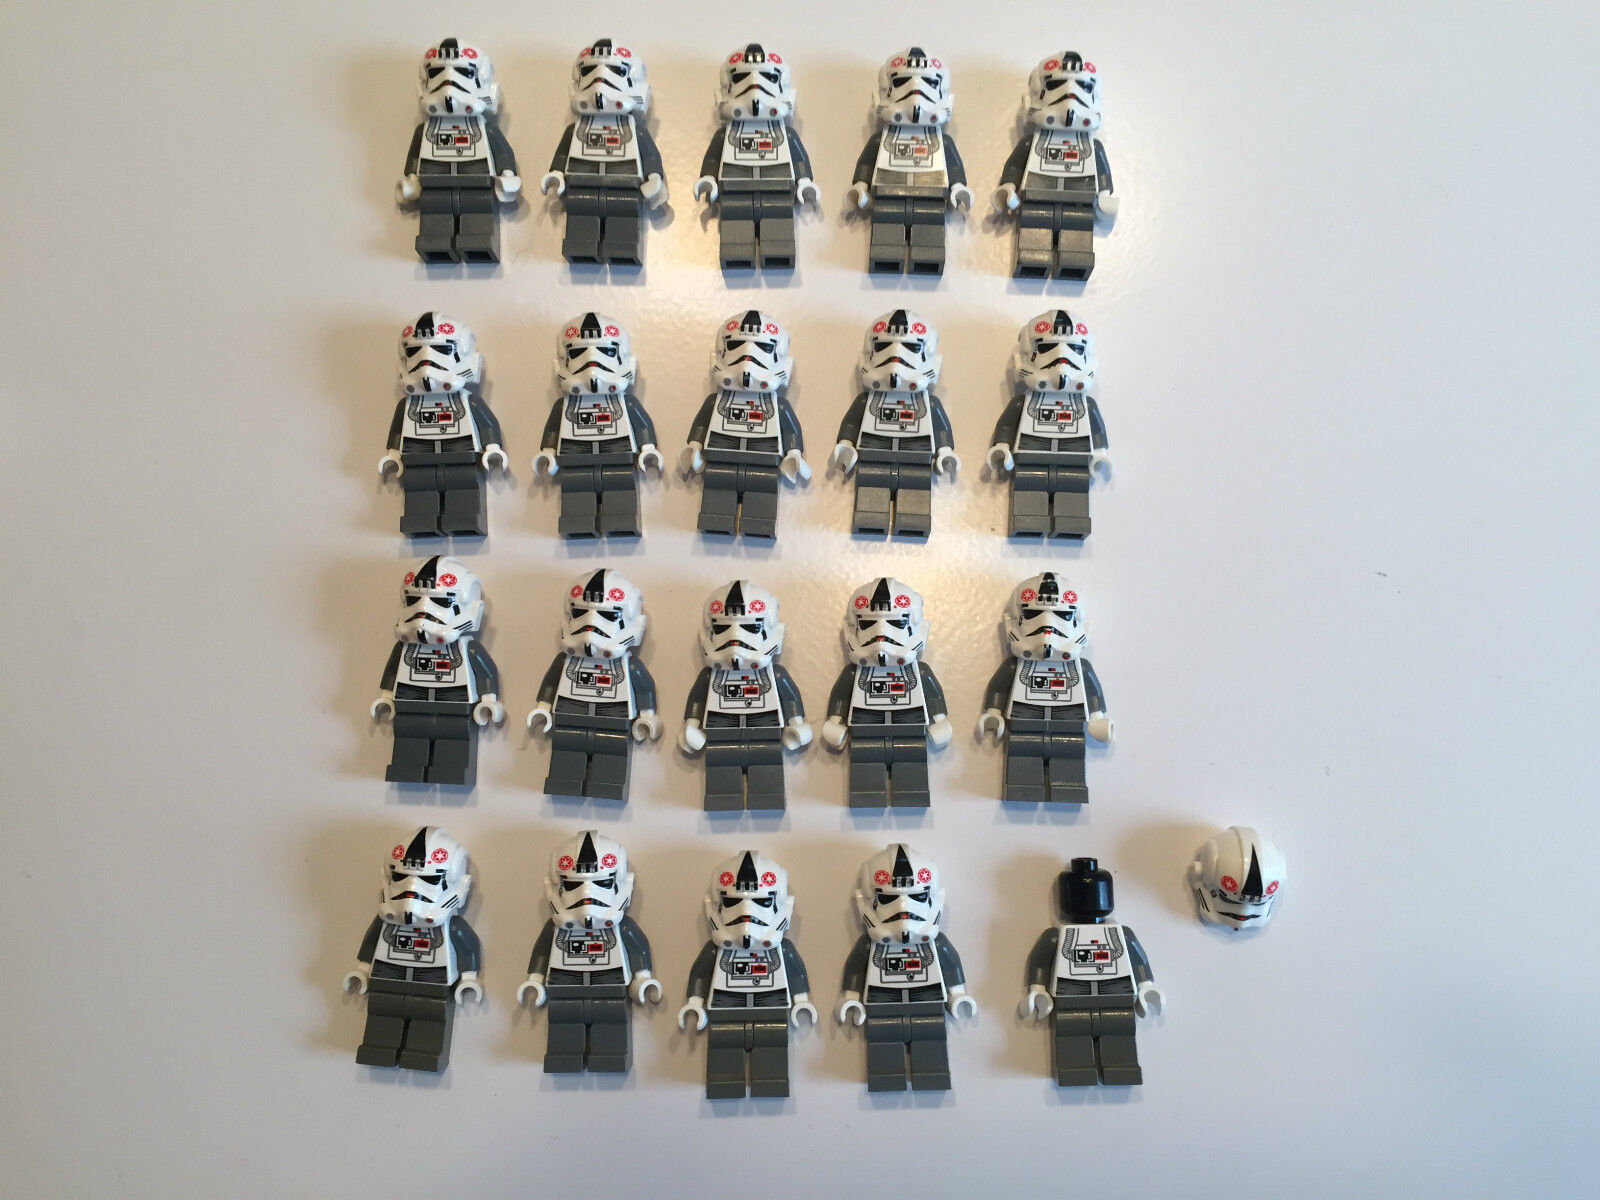 LEGO LEGO LEGO ARC ARF Clone Trooper Lot of 20 Star Wars Minifigure minifig Pilot S261 159237